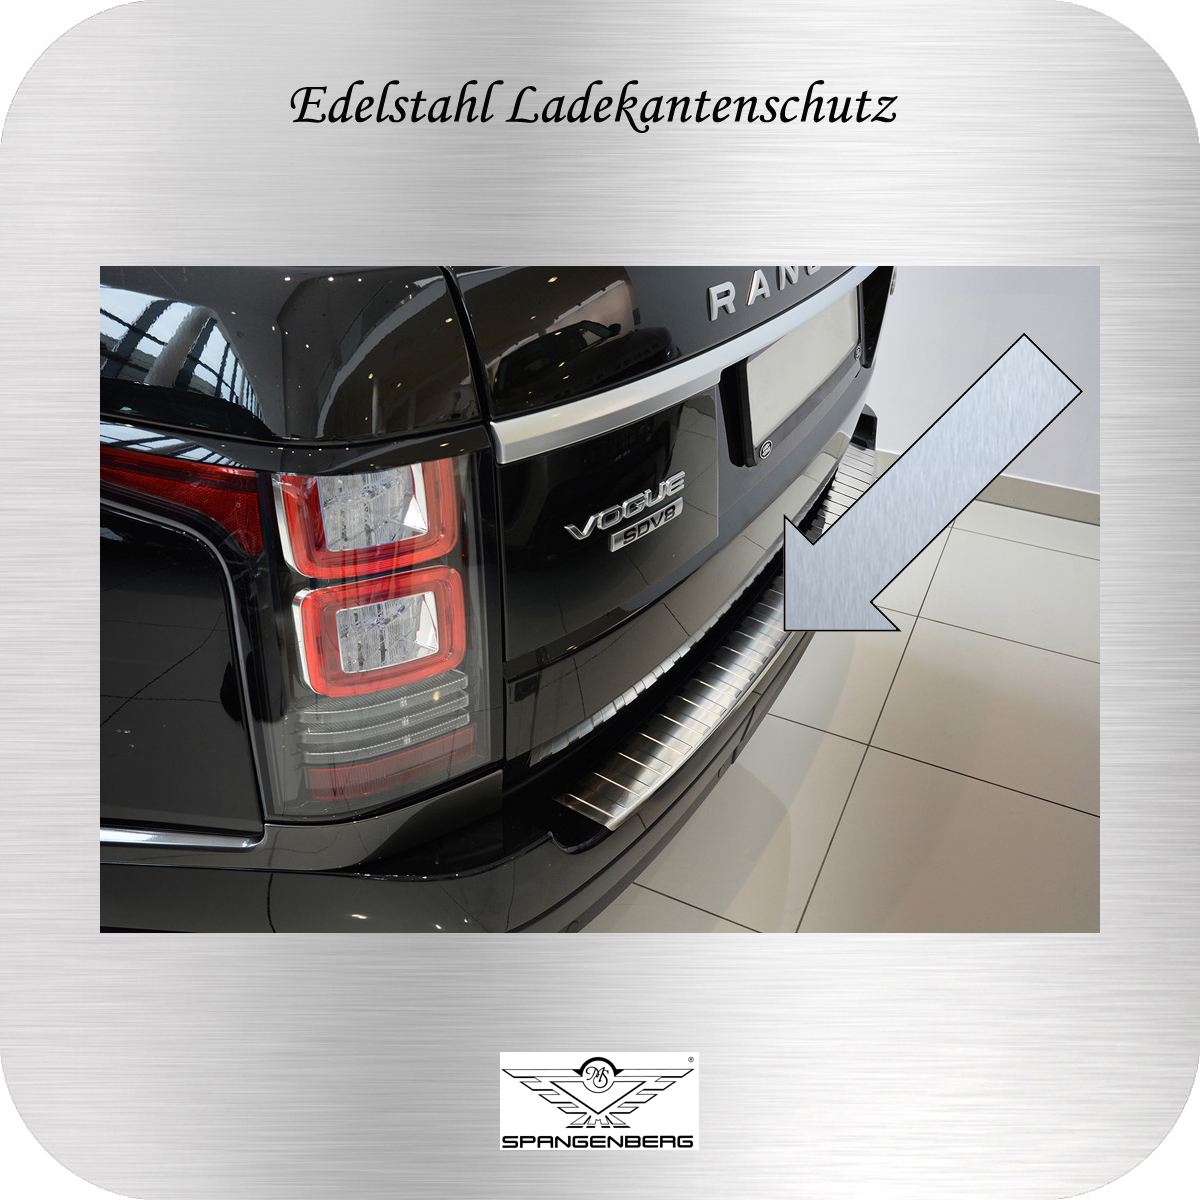 Ladekantenschutz Edelstahl Land Rover Range Rover IV 2012- 3235338